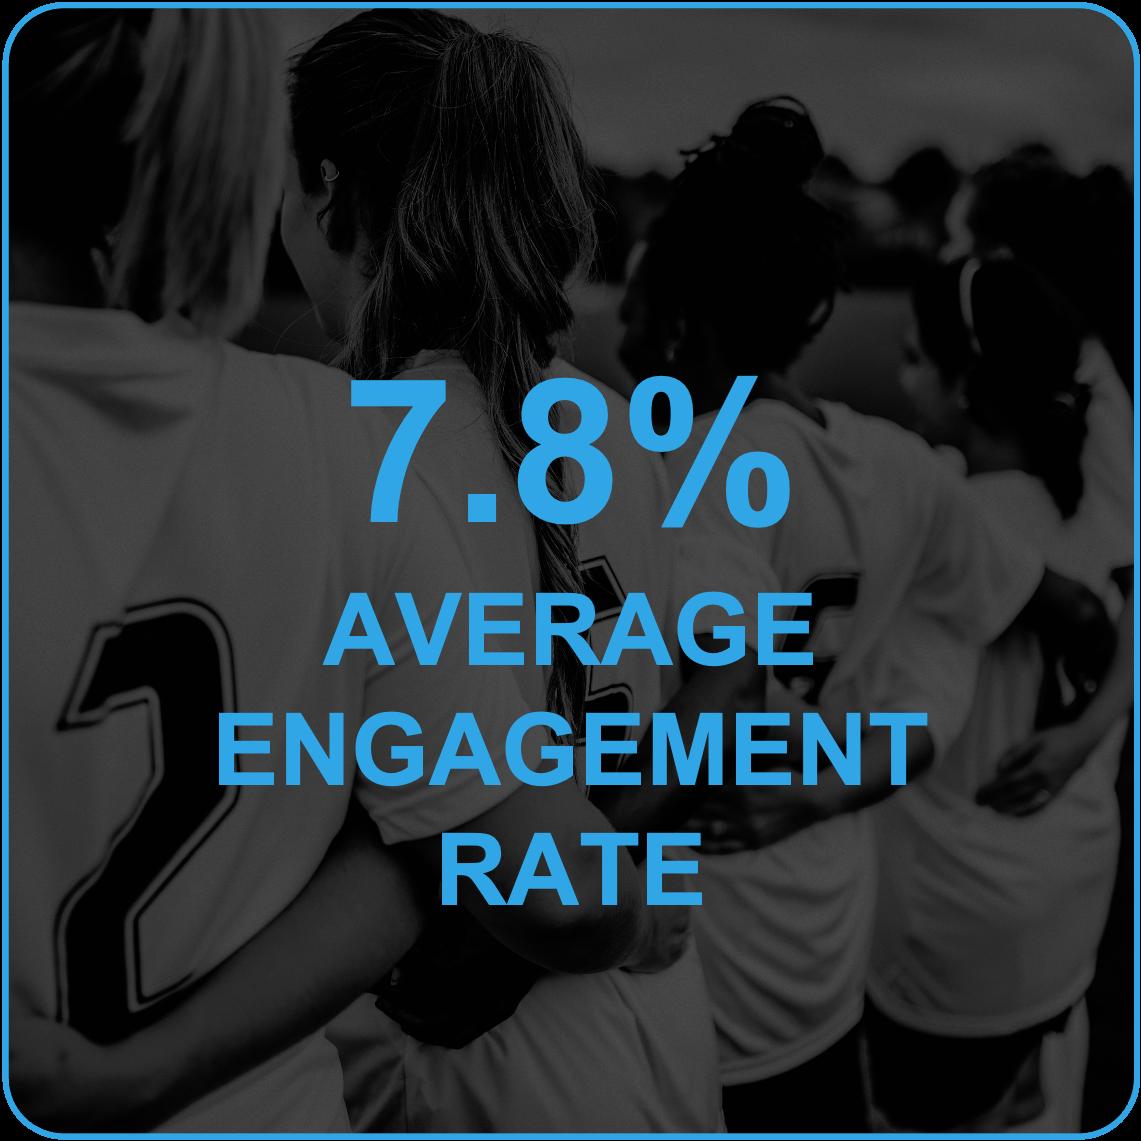 7.8% average engagement rate